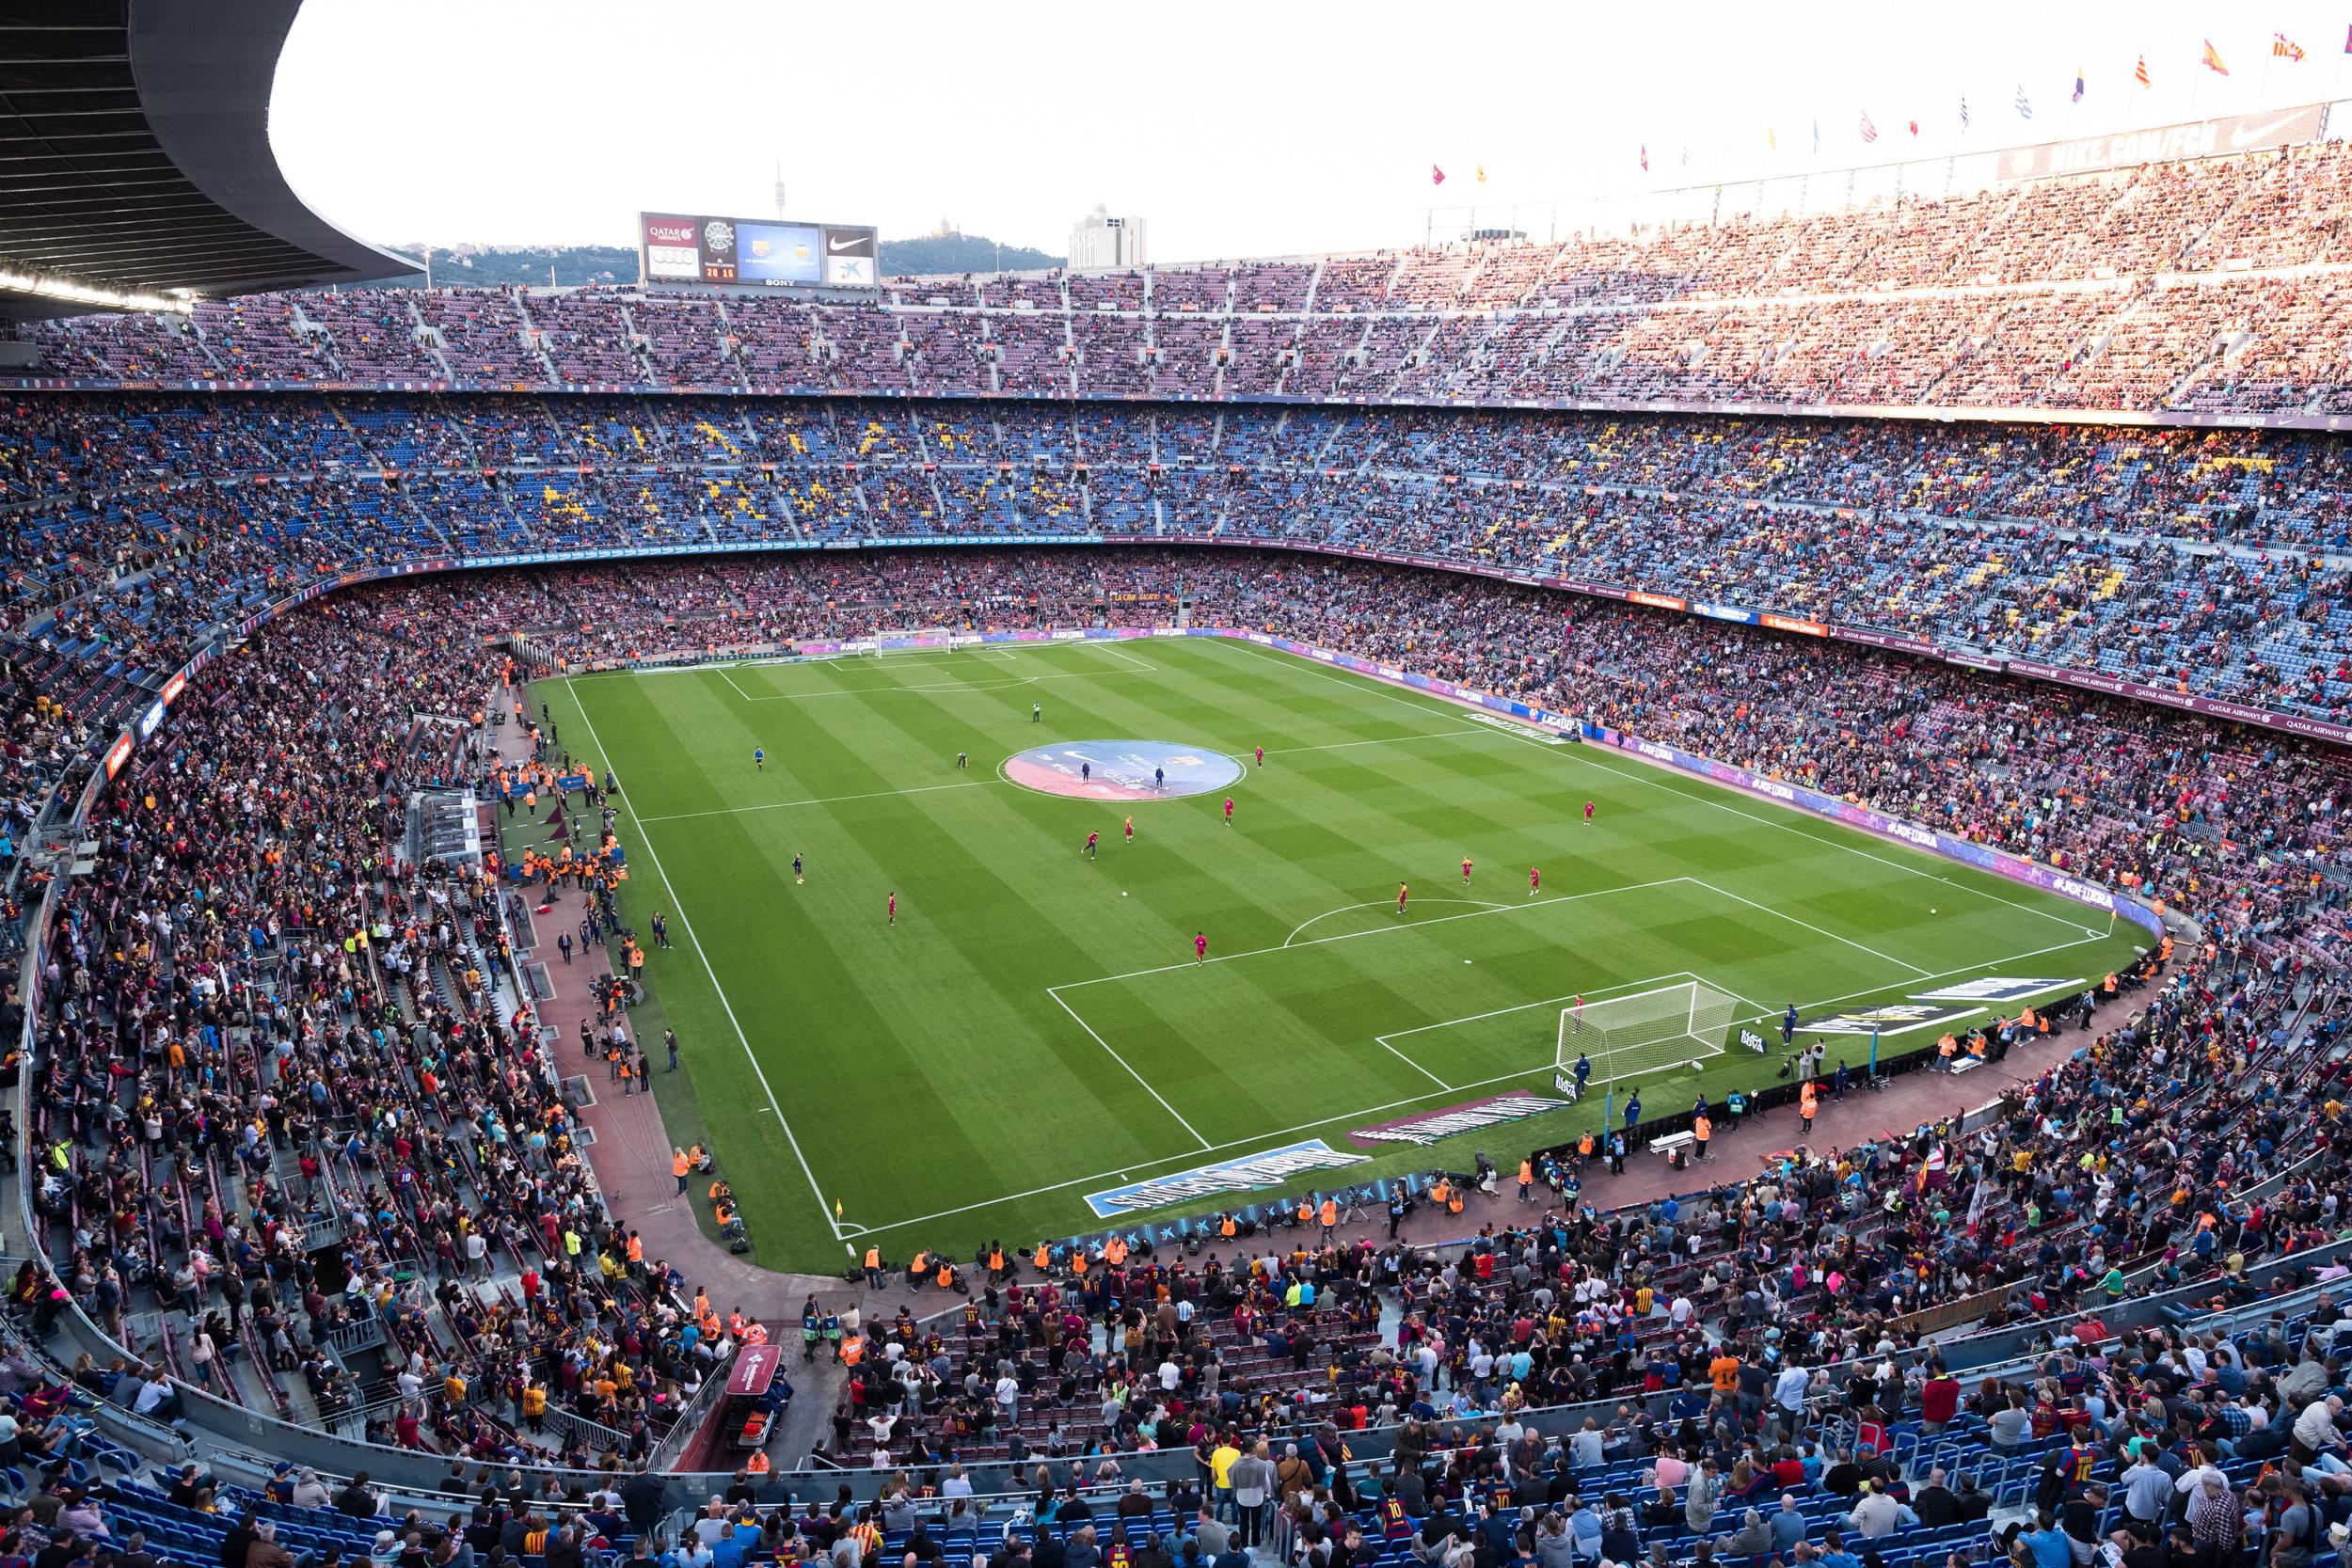 Camp Nou, Barcelona,  Spain , Fujifilm X-Pro2, XF 14mm f/2.8 R @ f/5, stitched in LR